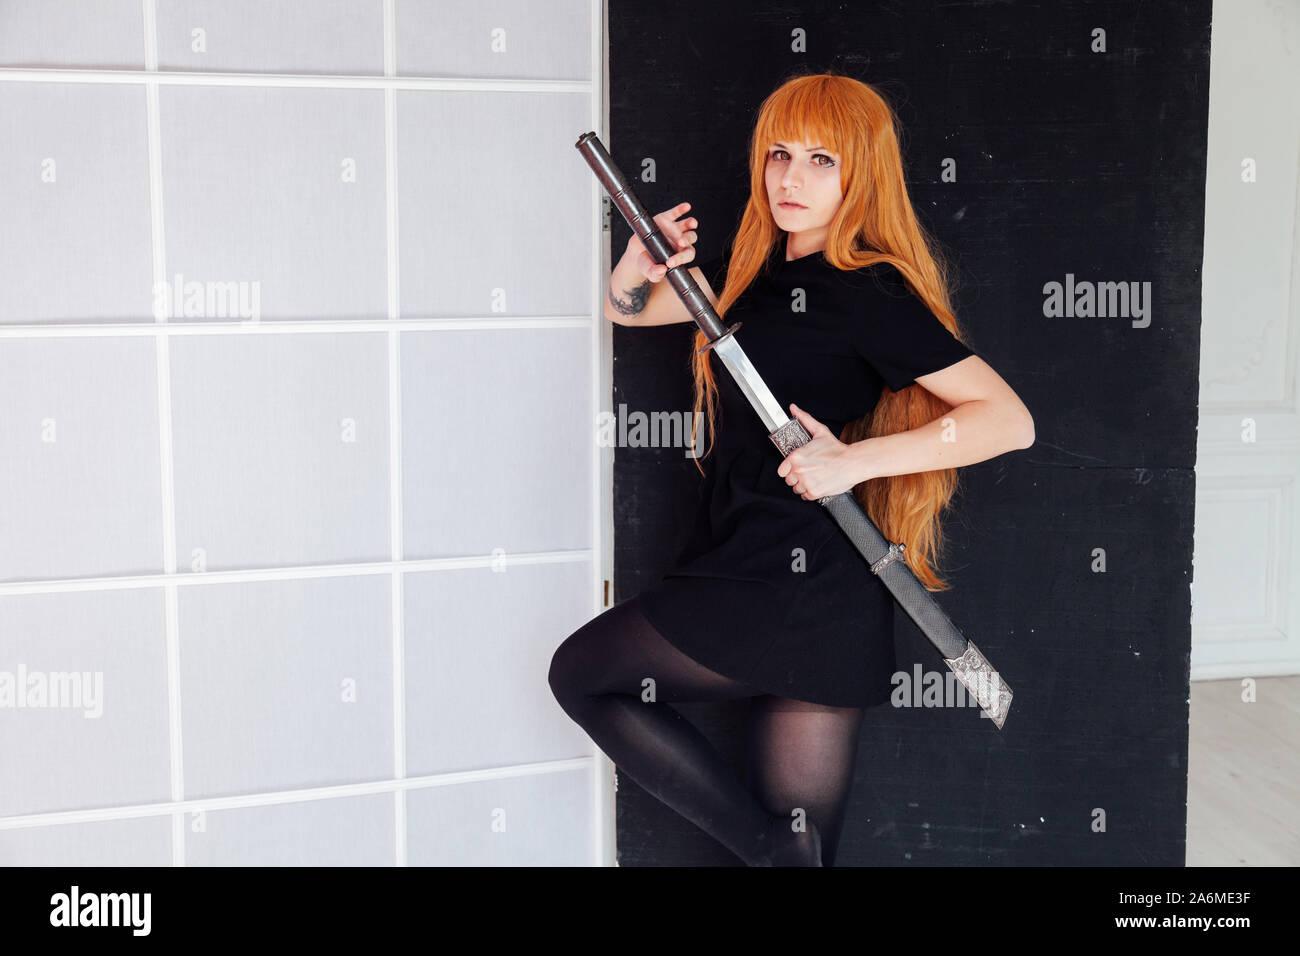 Girl sword Japan cosplayer anime red hair Stock Photo - Alamy